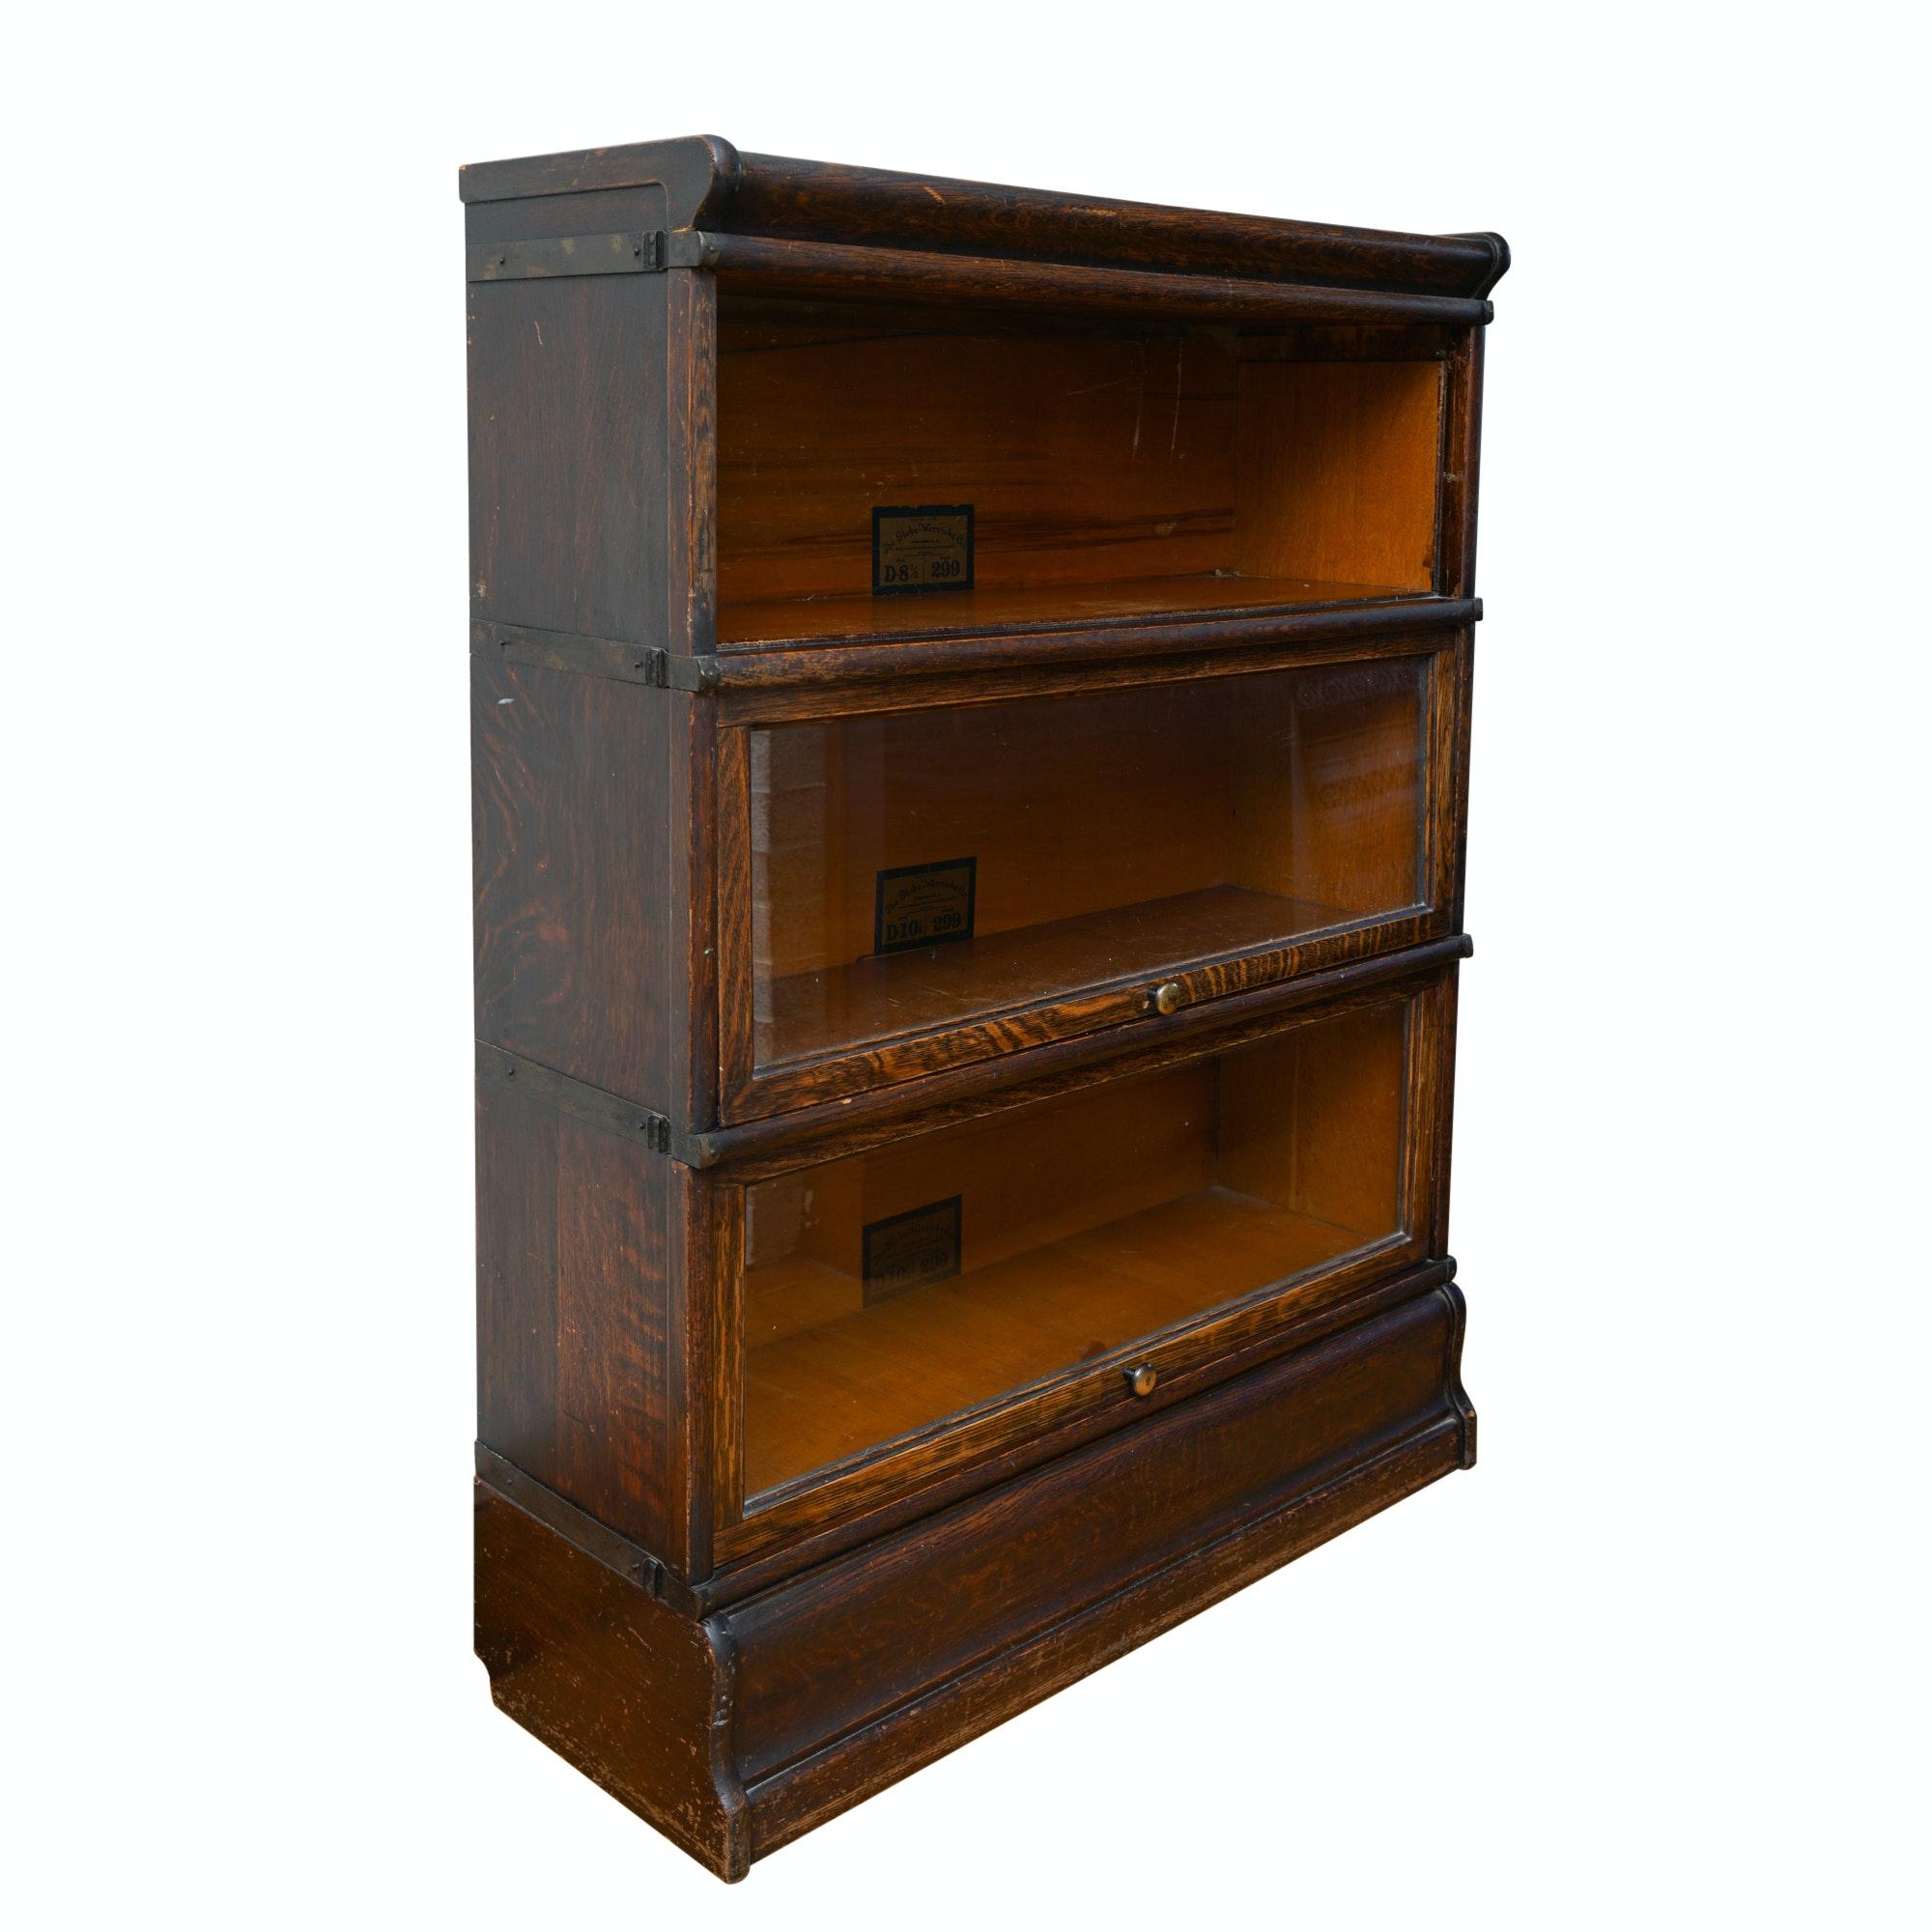 Vintage Oak Barrister Bookcase by Globe-Wernicke